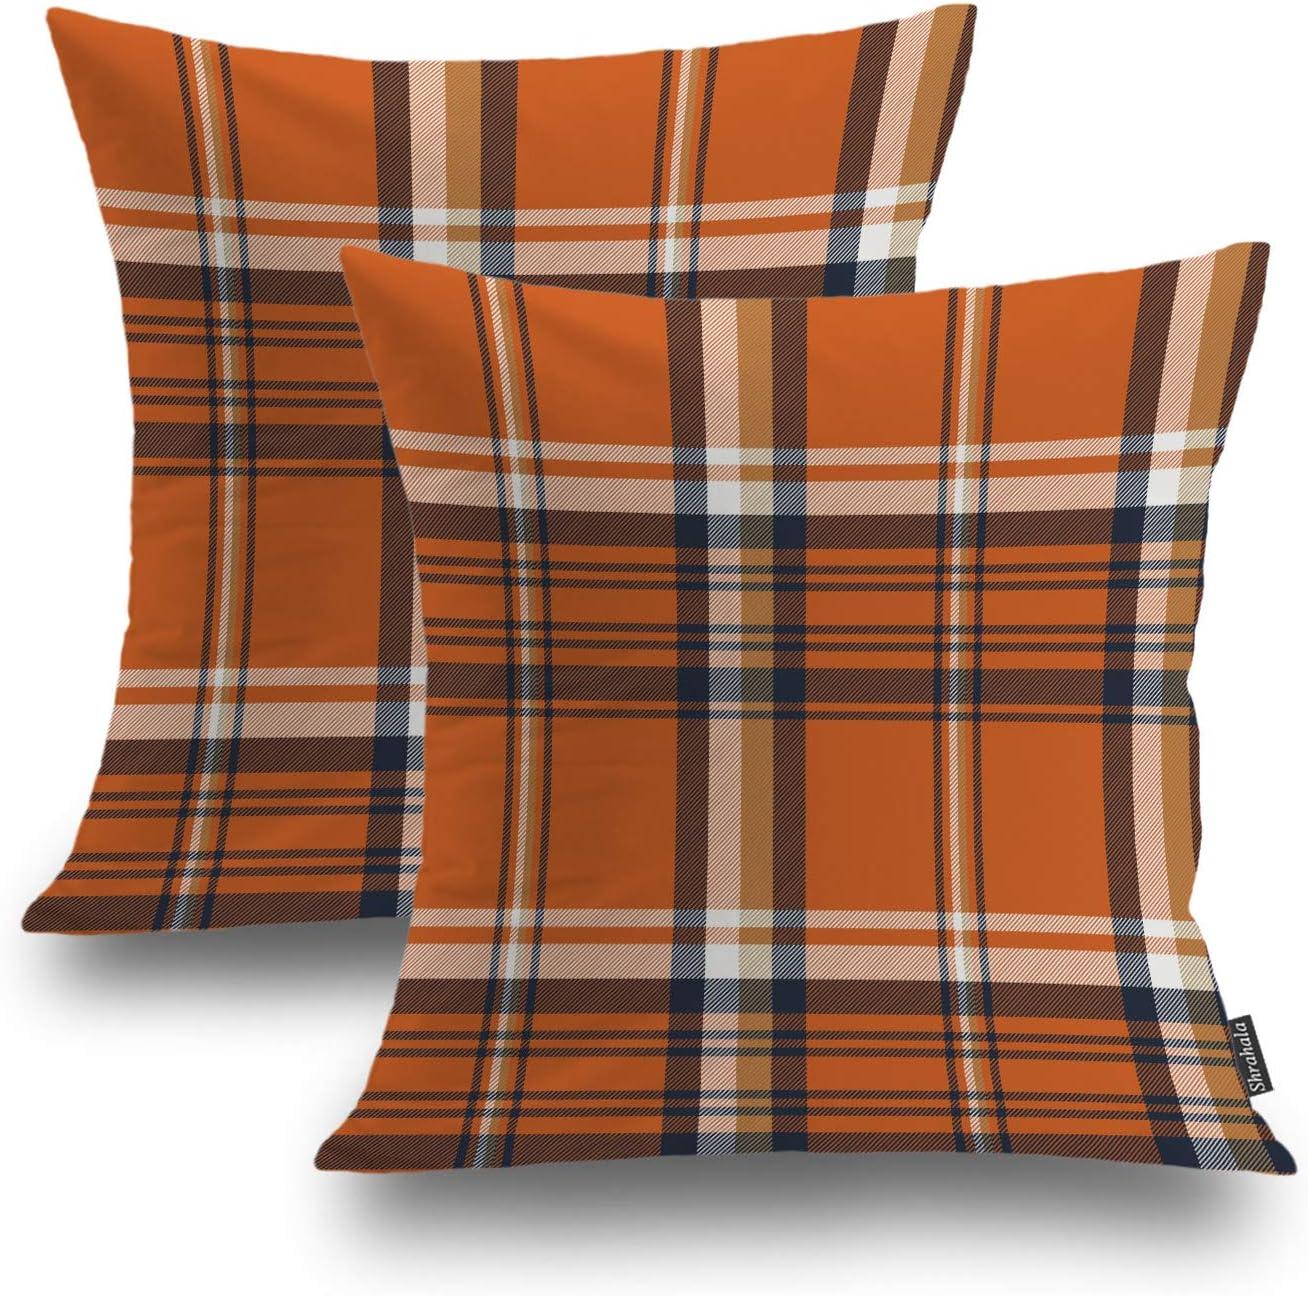 Shrahala Orange Plaid Decorative Pillow Covers, Orange Gingham Check Plaid Pattern Cushion Case for Sofa Bedroom Car Throw Pillow Covers Cushion Cover Square 16 x 16 inches Orange, Set of 2